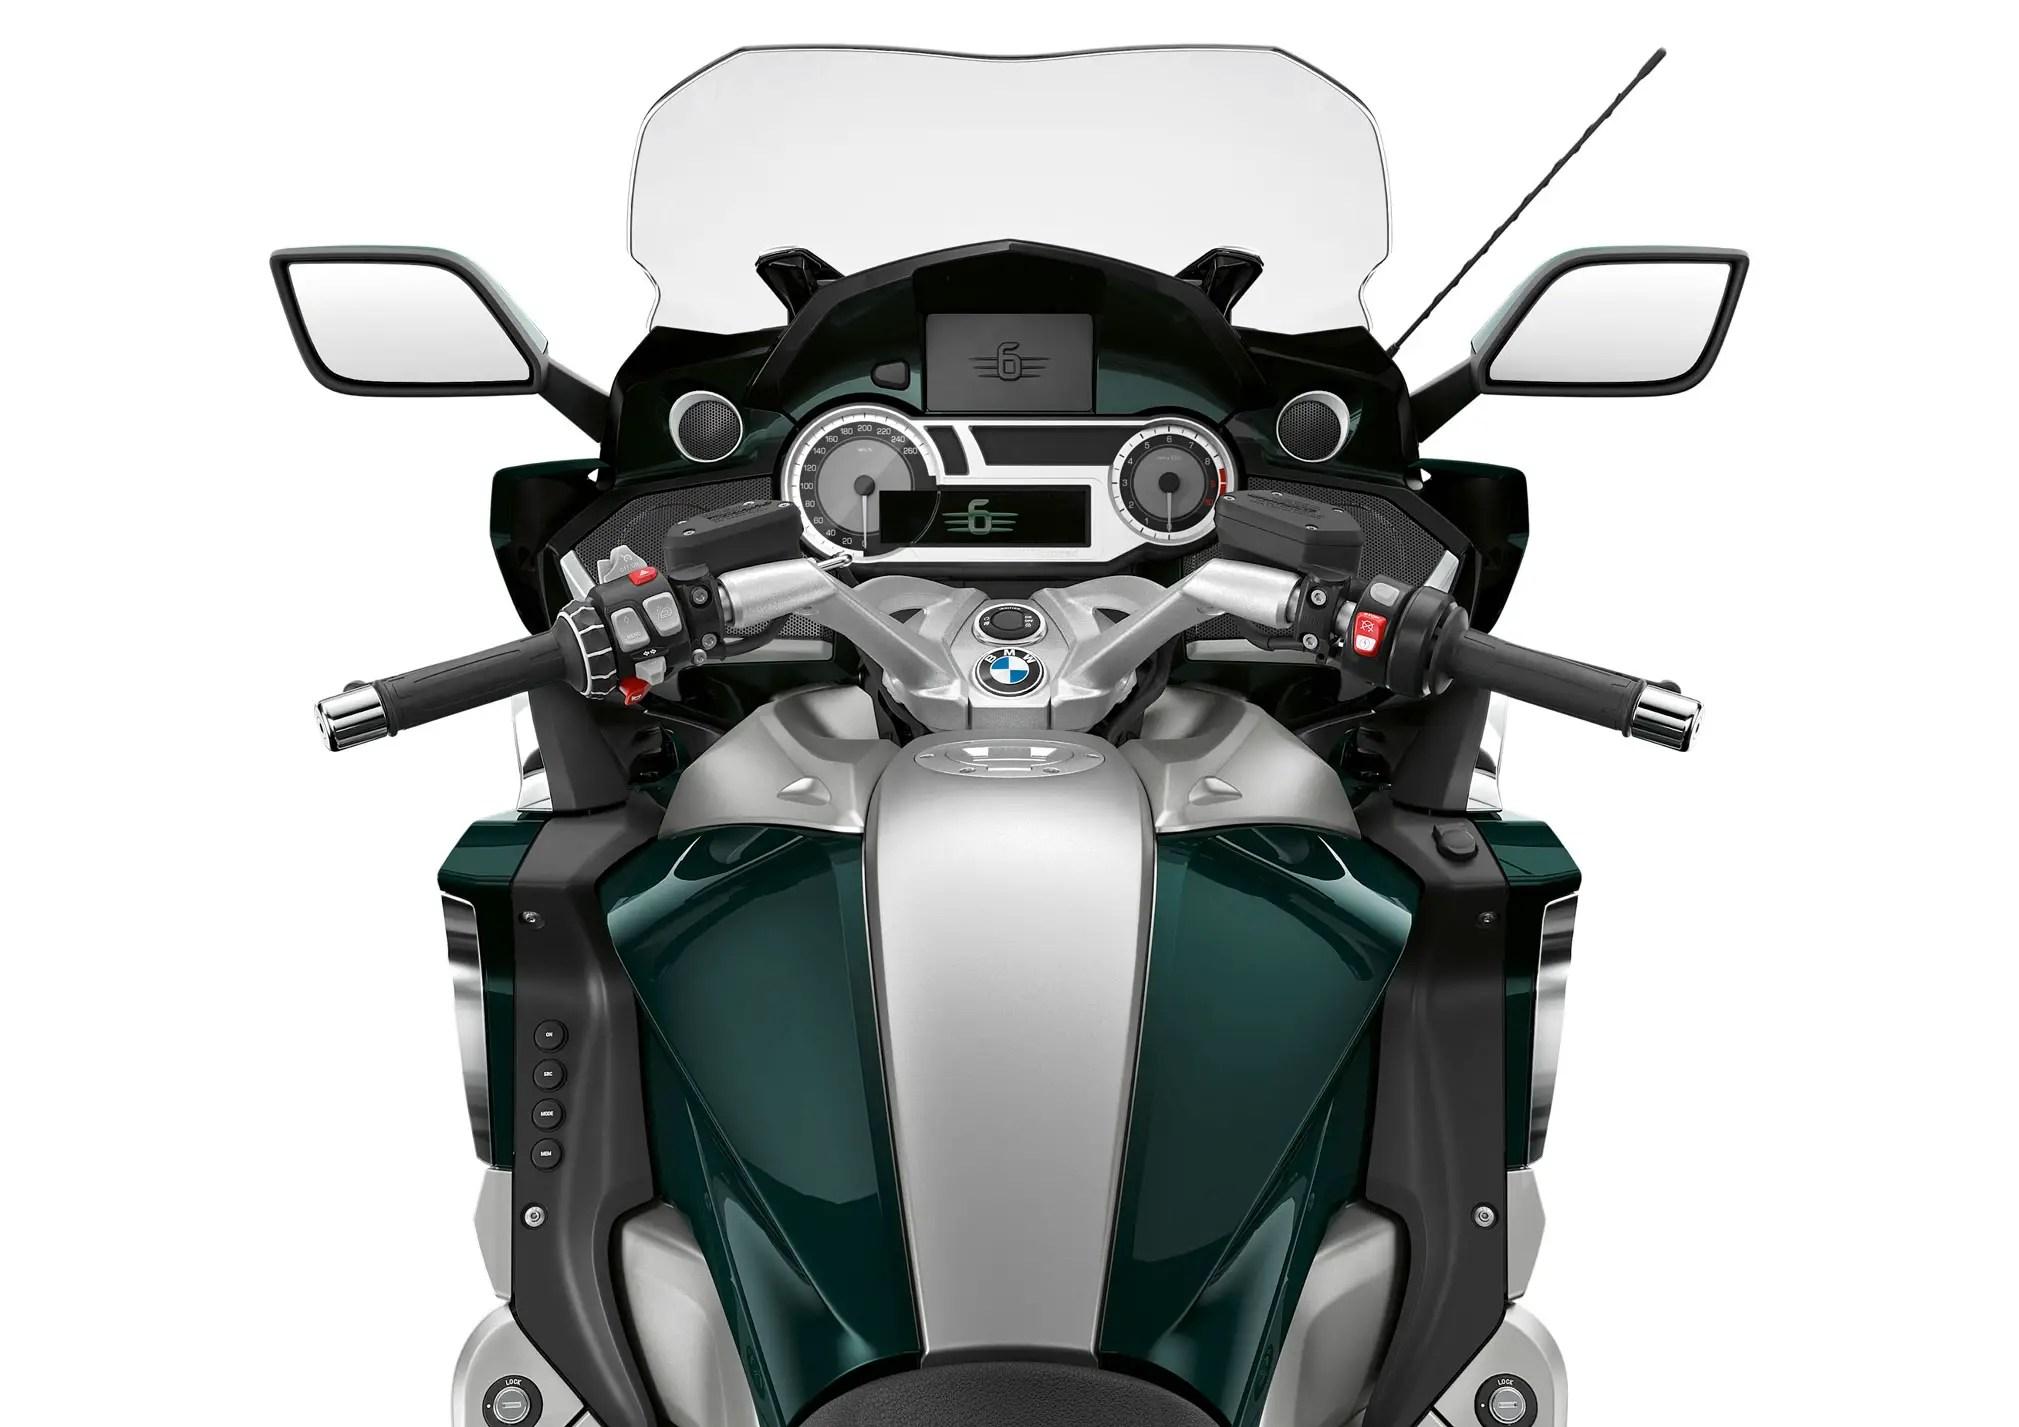 2019 Bmw K1600gtl Guide • Totalmotorcycle